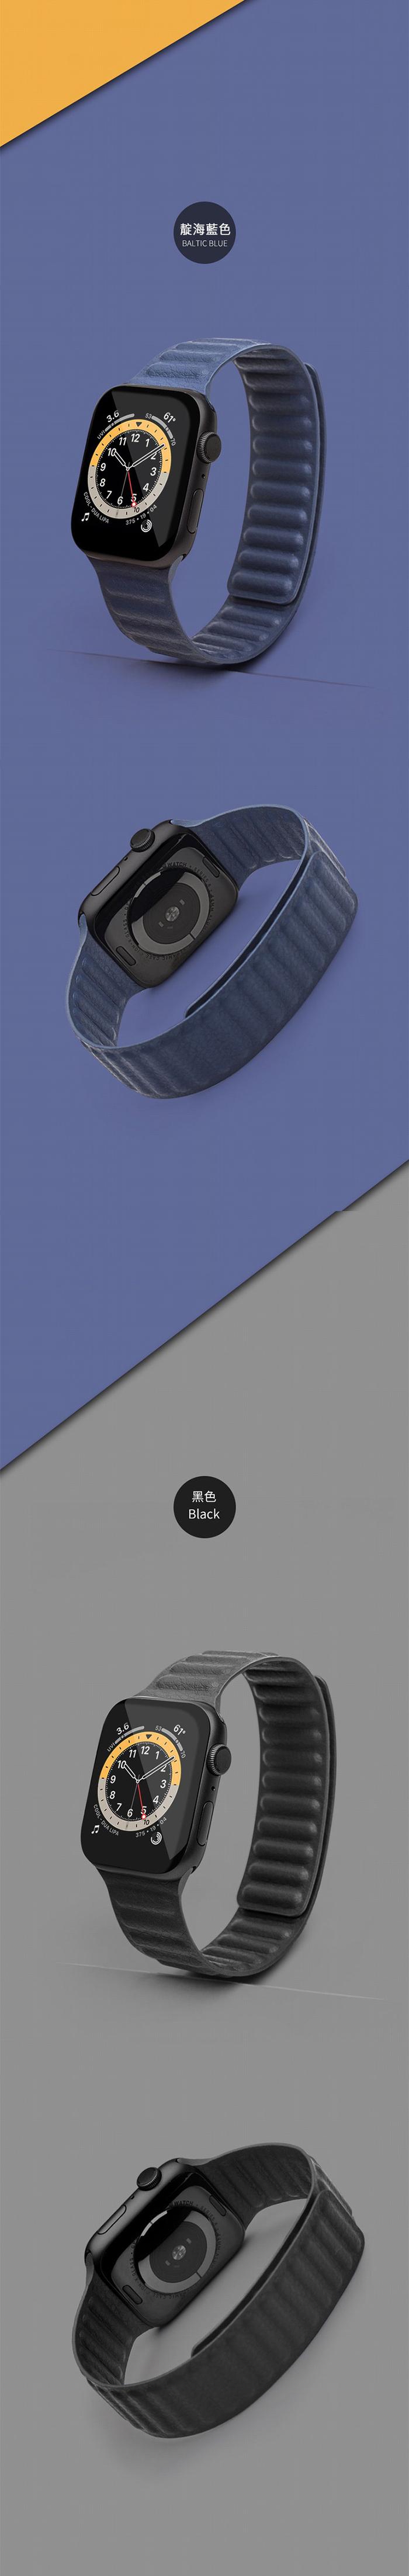 (複製)Younal|LED 補光化妝盒